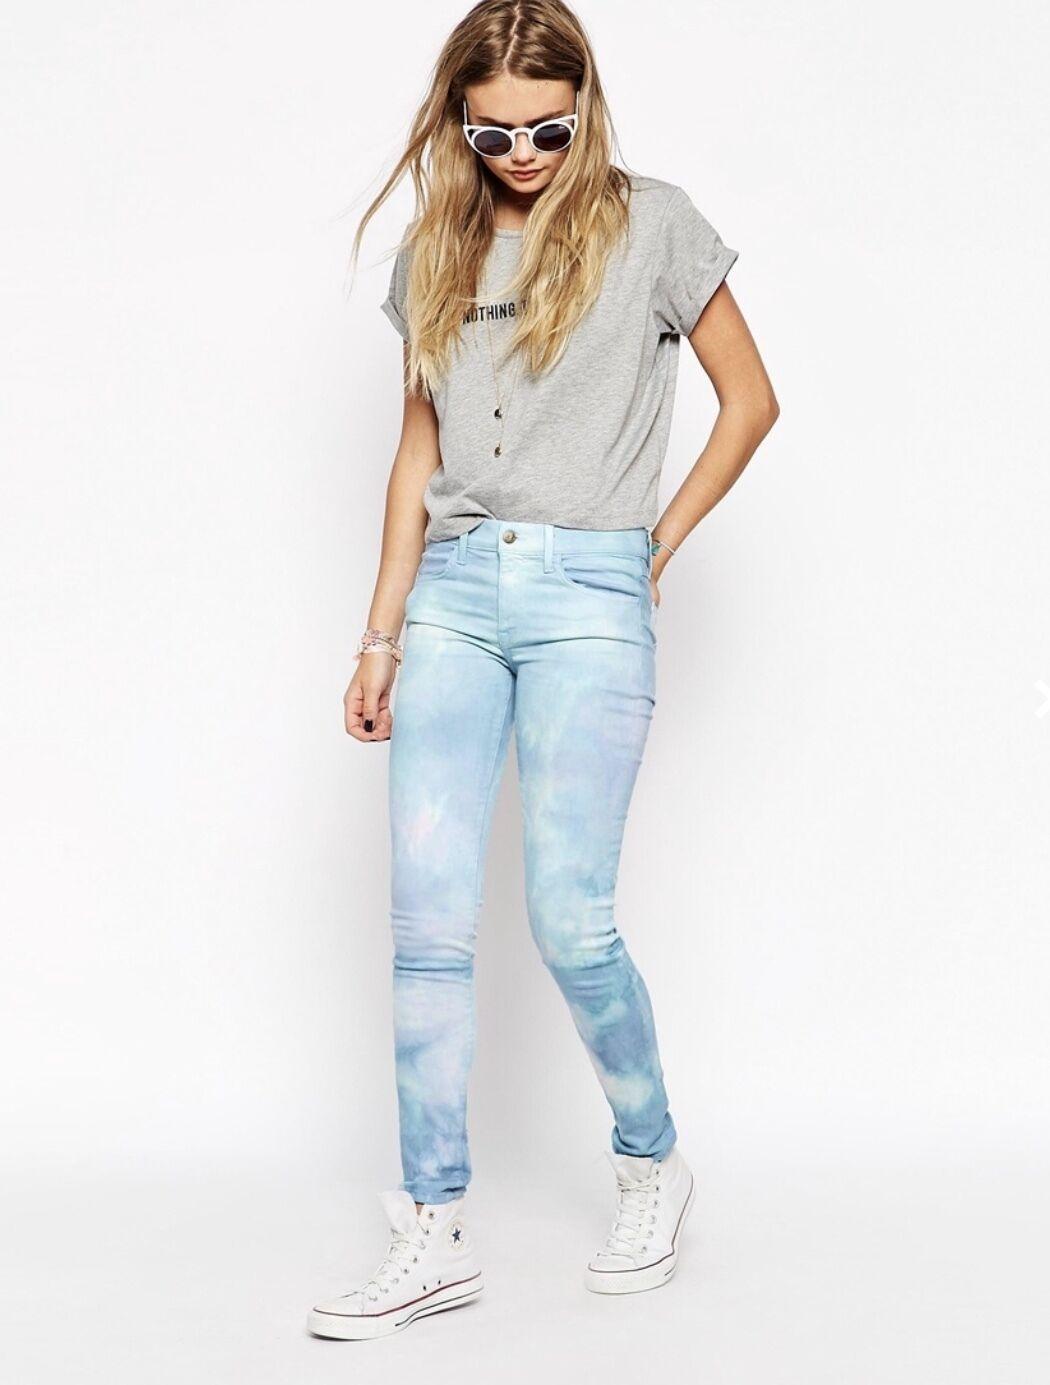 NWT WILDFOX bluee aqua pink Tie Dye Daydream Marianne Stretch Skinny Jeans 25